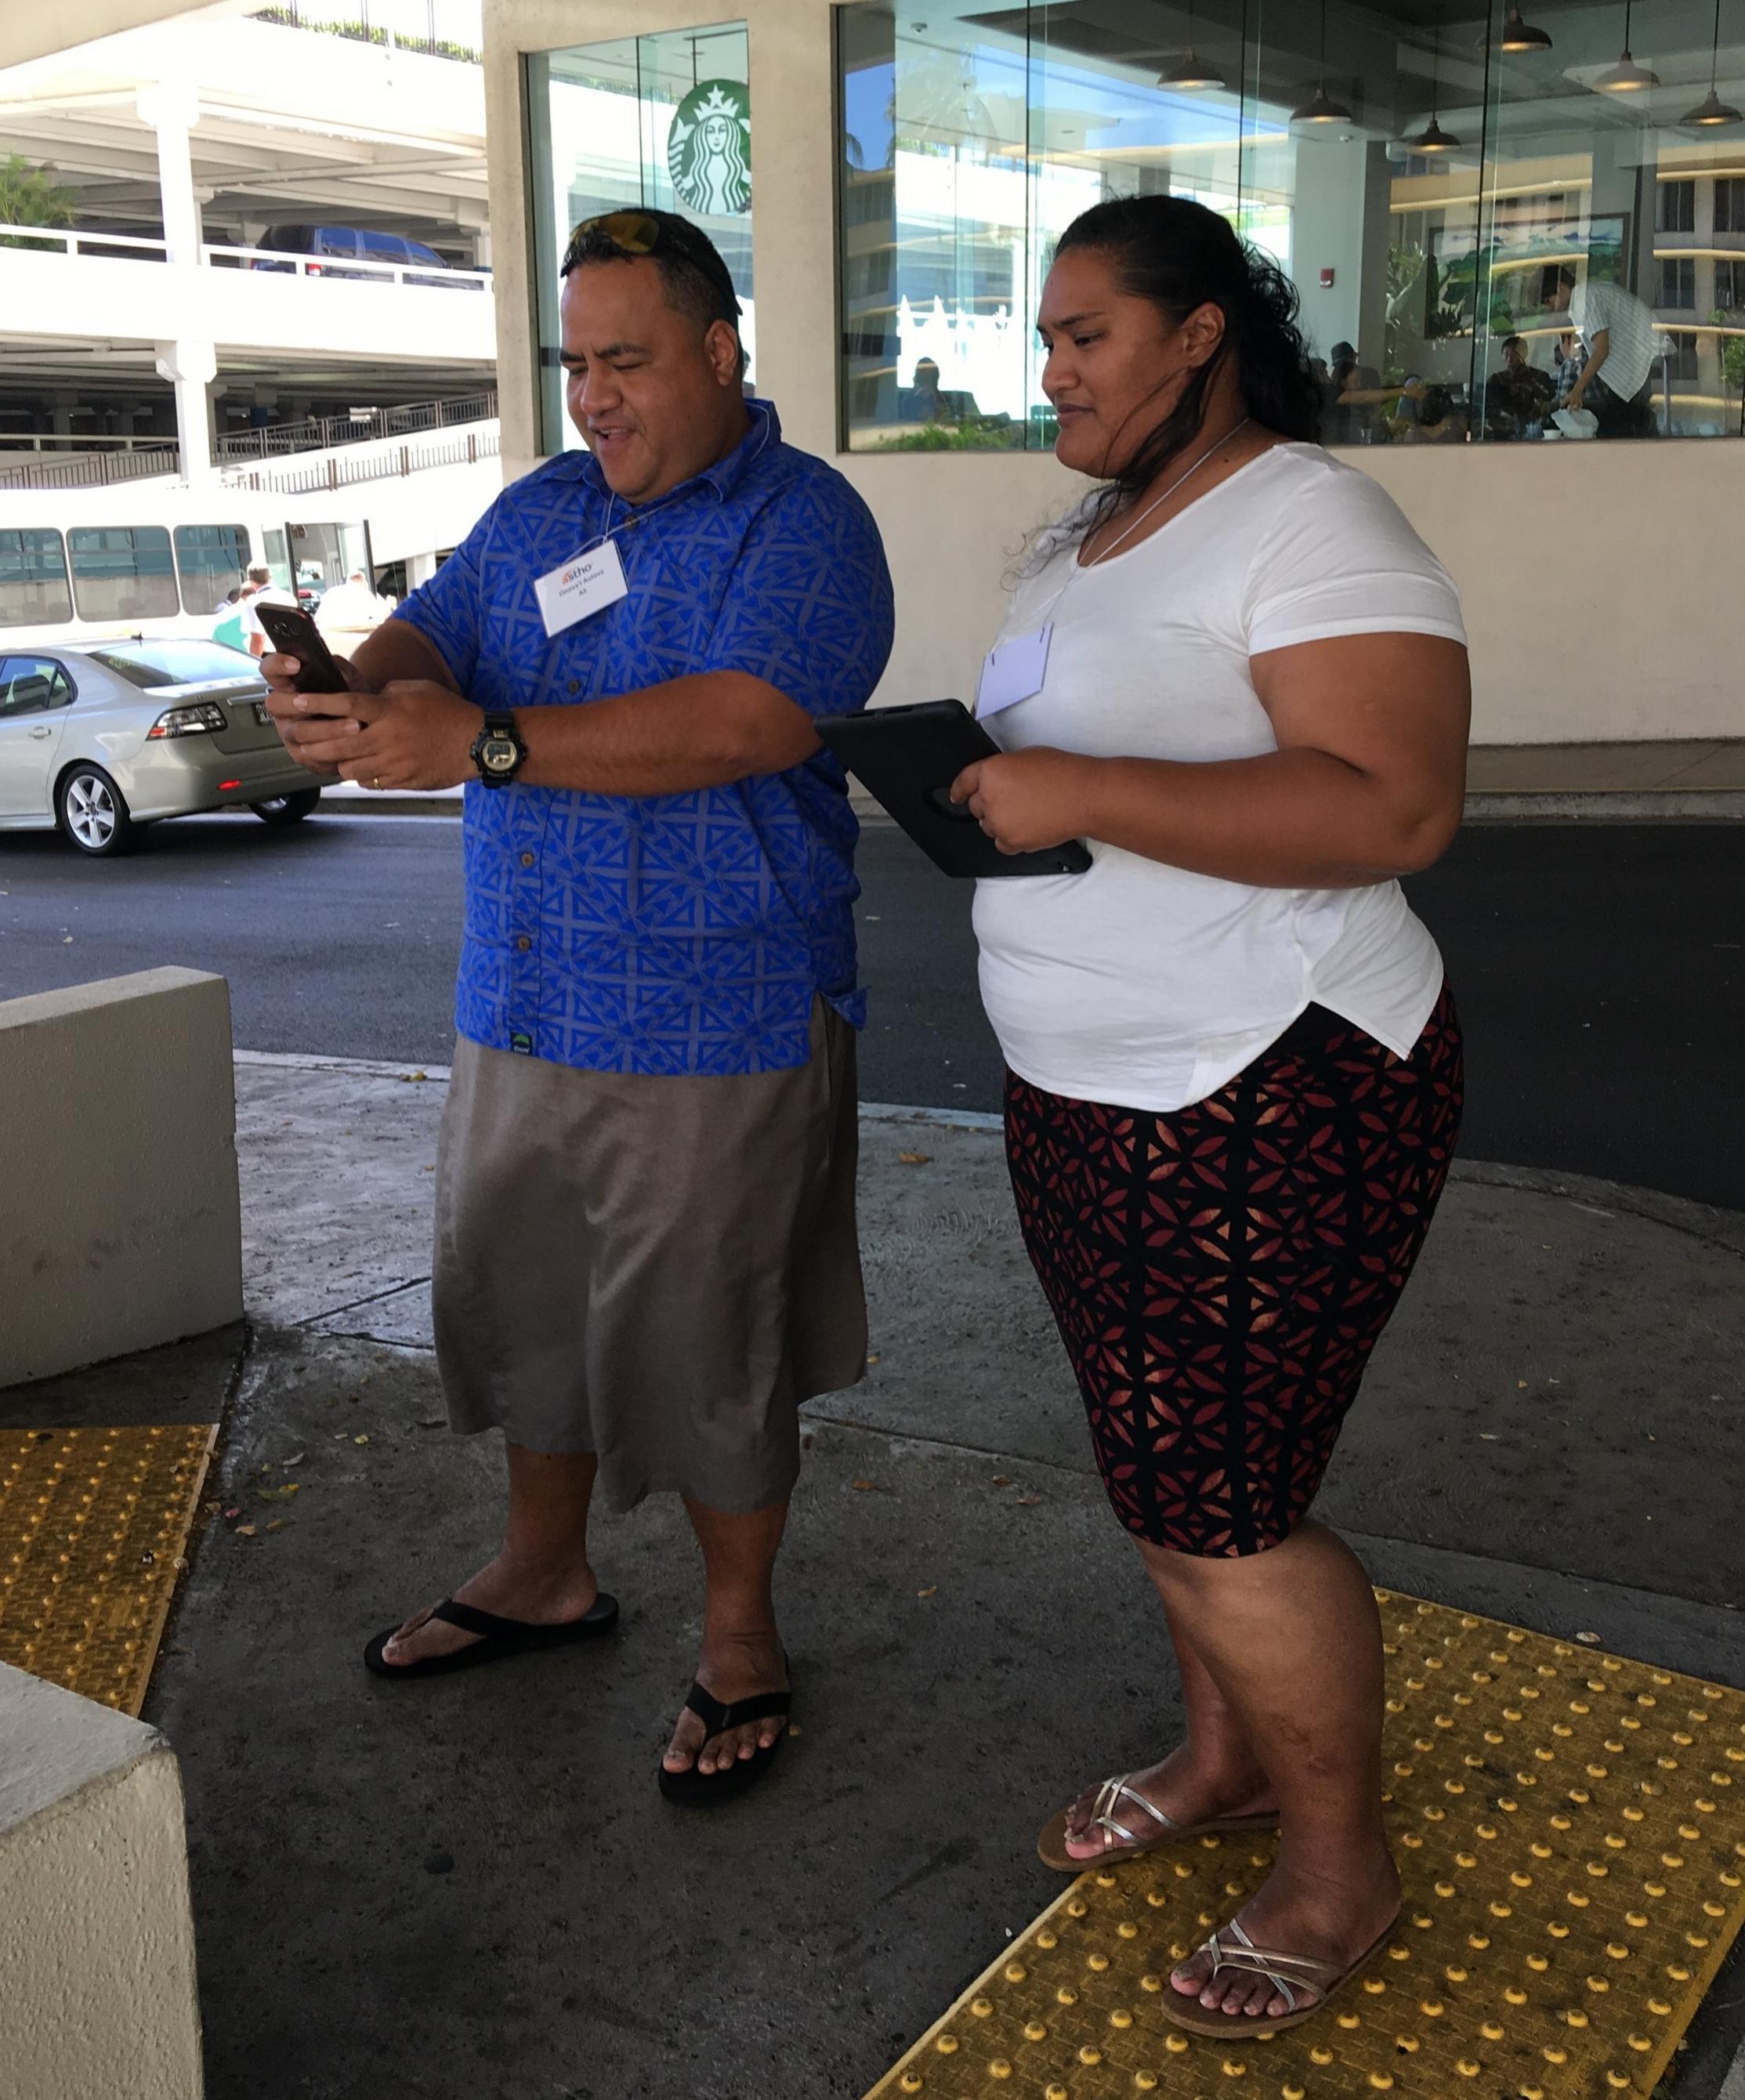 Onasai'i Aulava & Ruta Ropeti from American Samoa learning to use Fulcrum